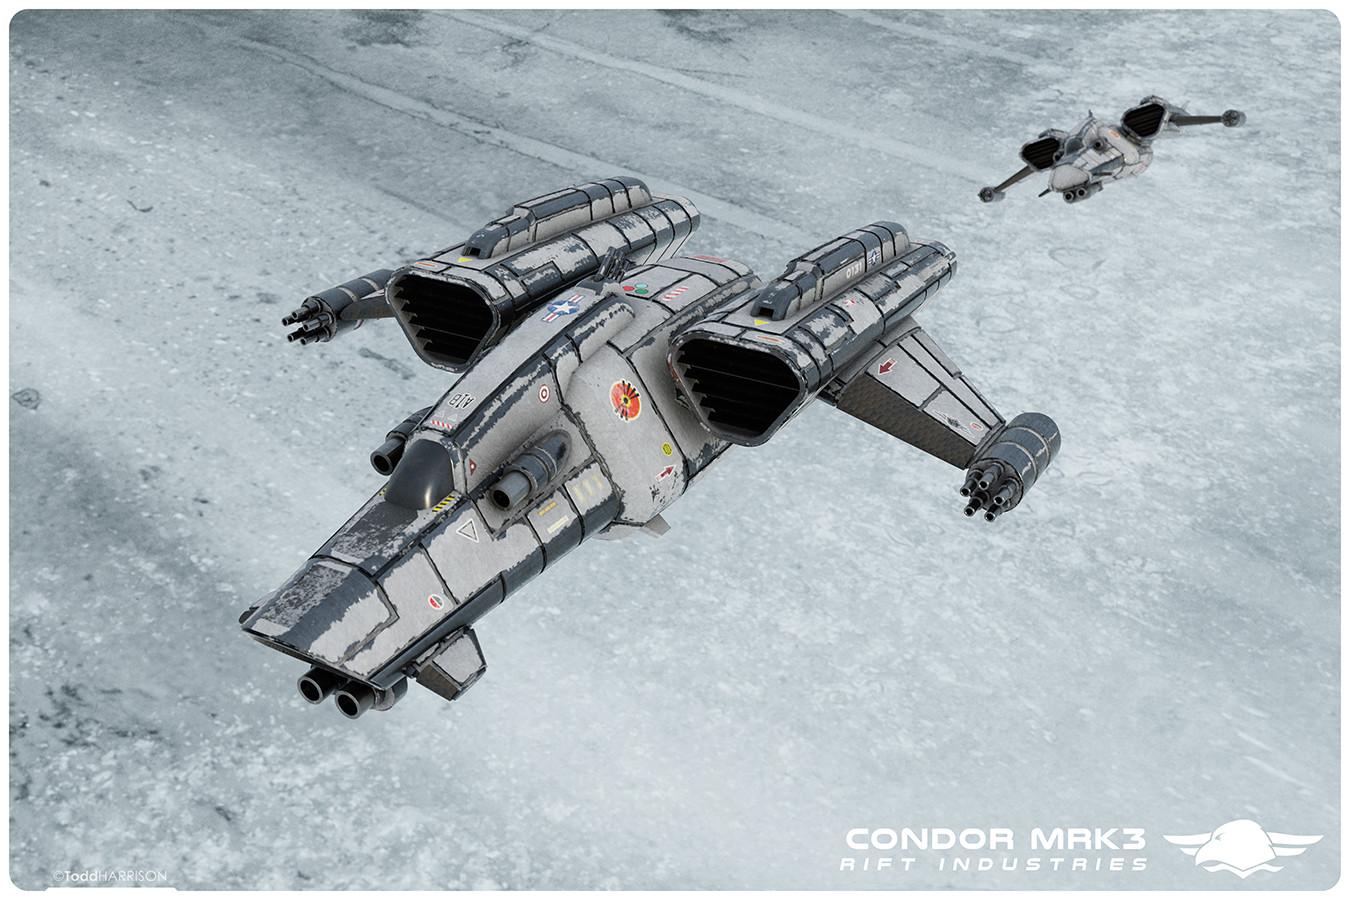 Todd harrison ri condor mrk3 pair over glacial fields web